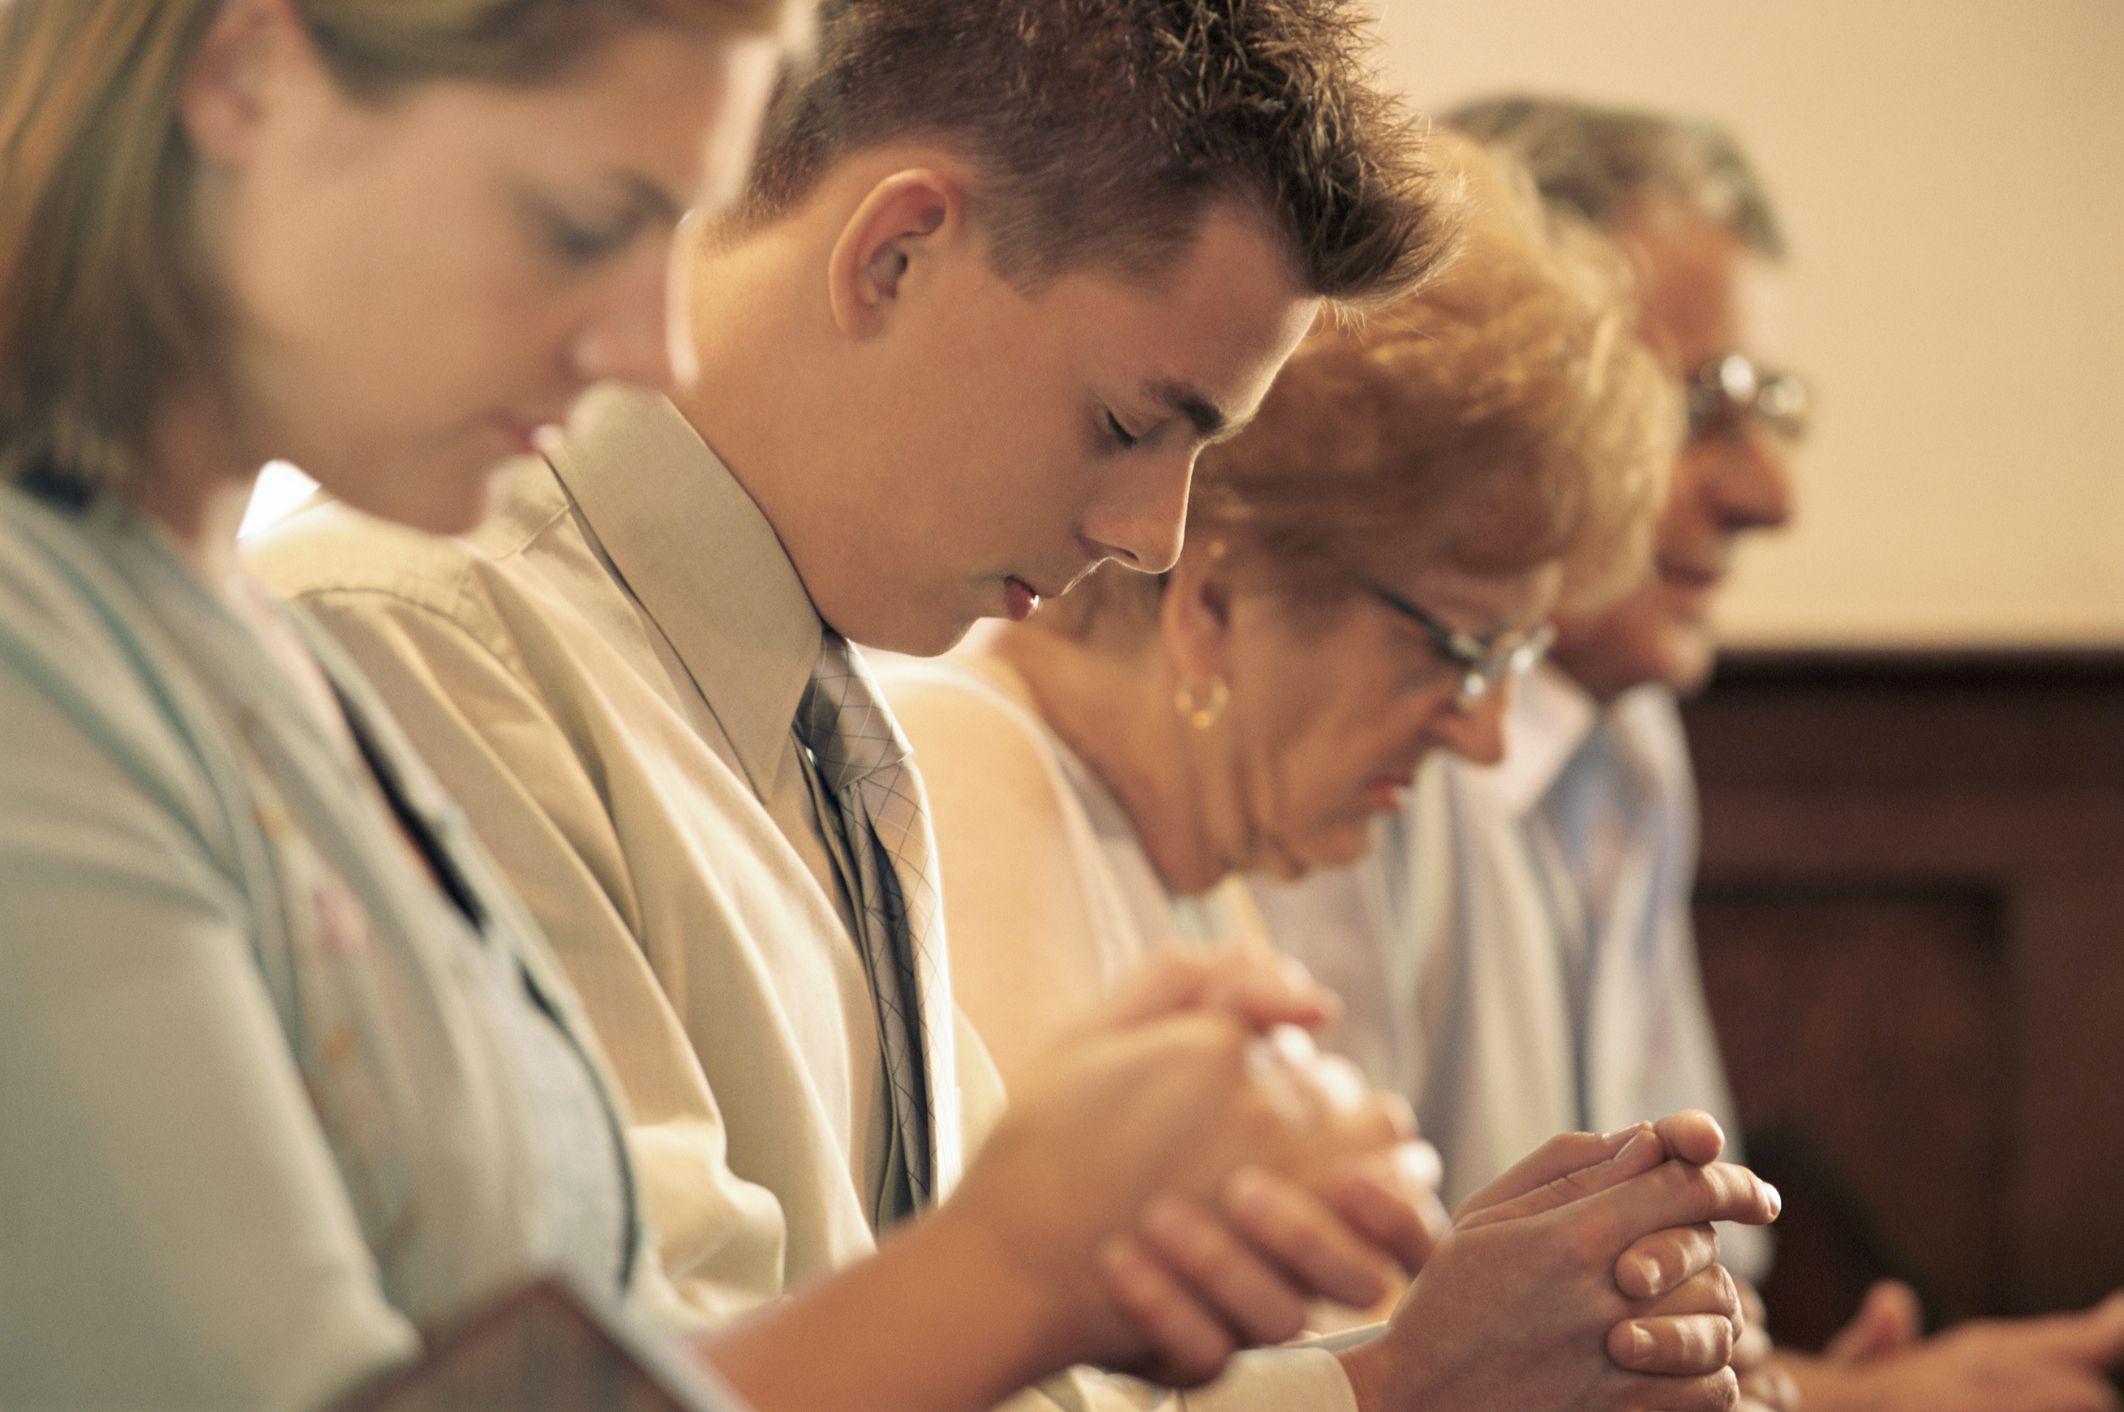 8 Tips For Church Etiquette